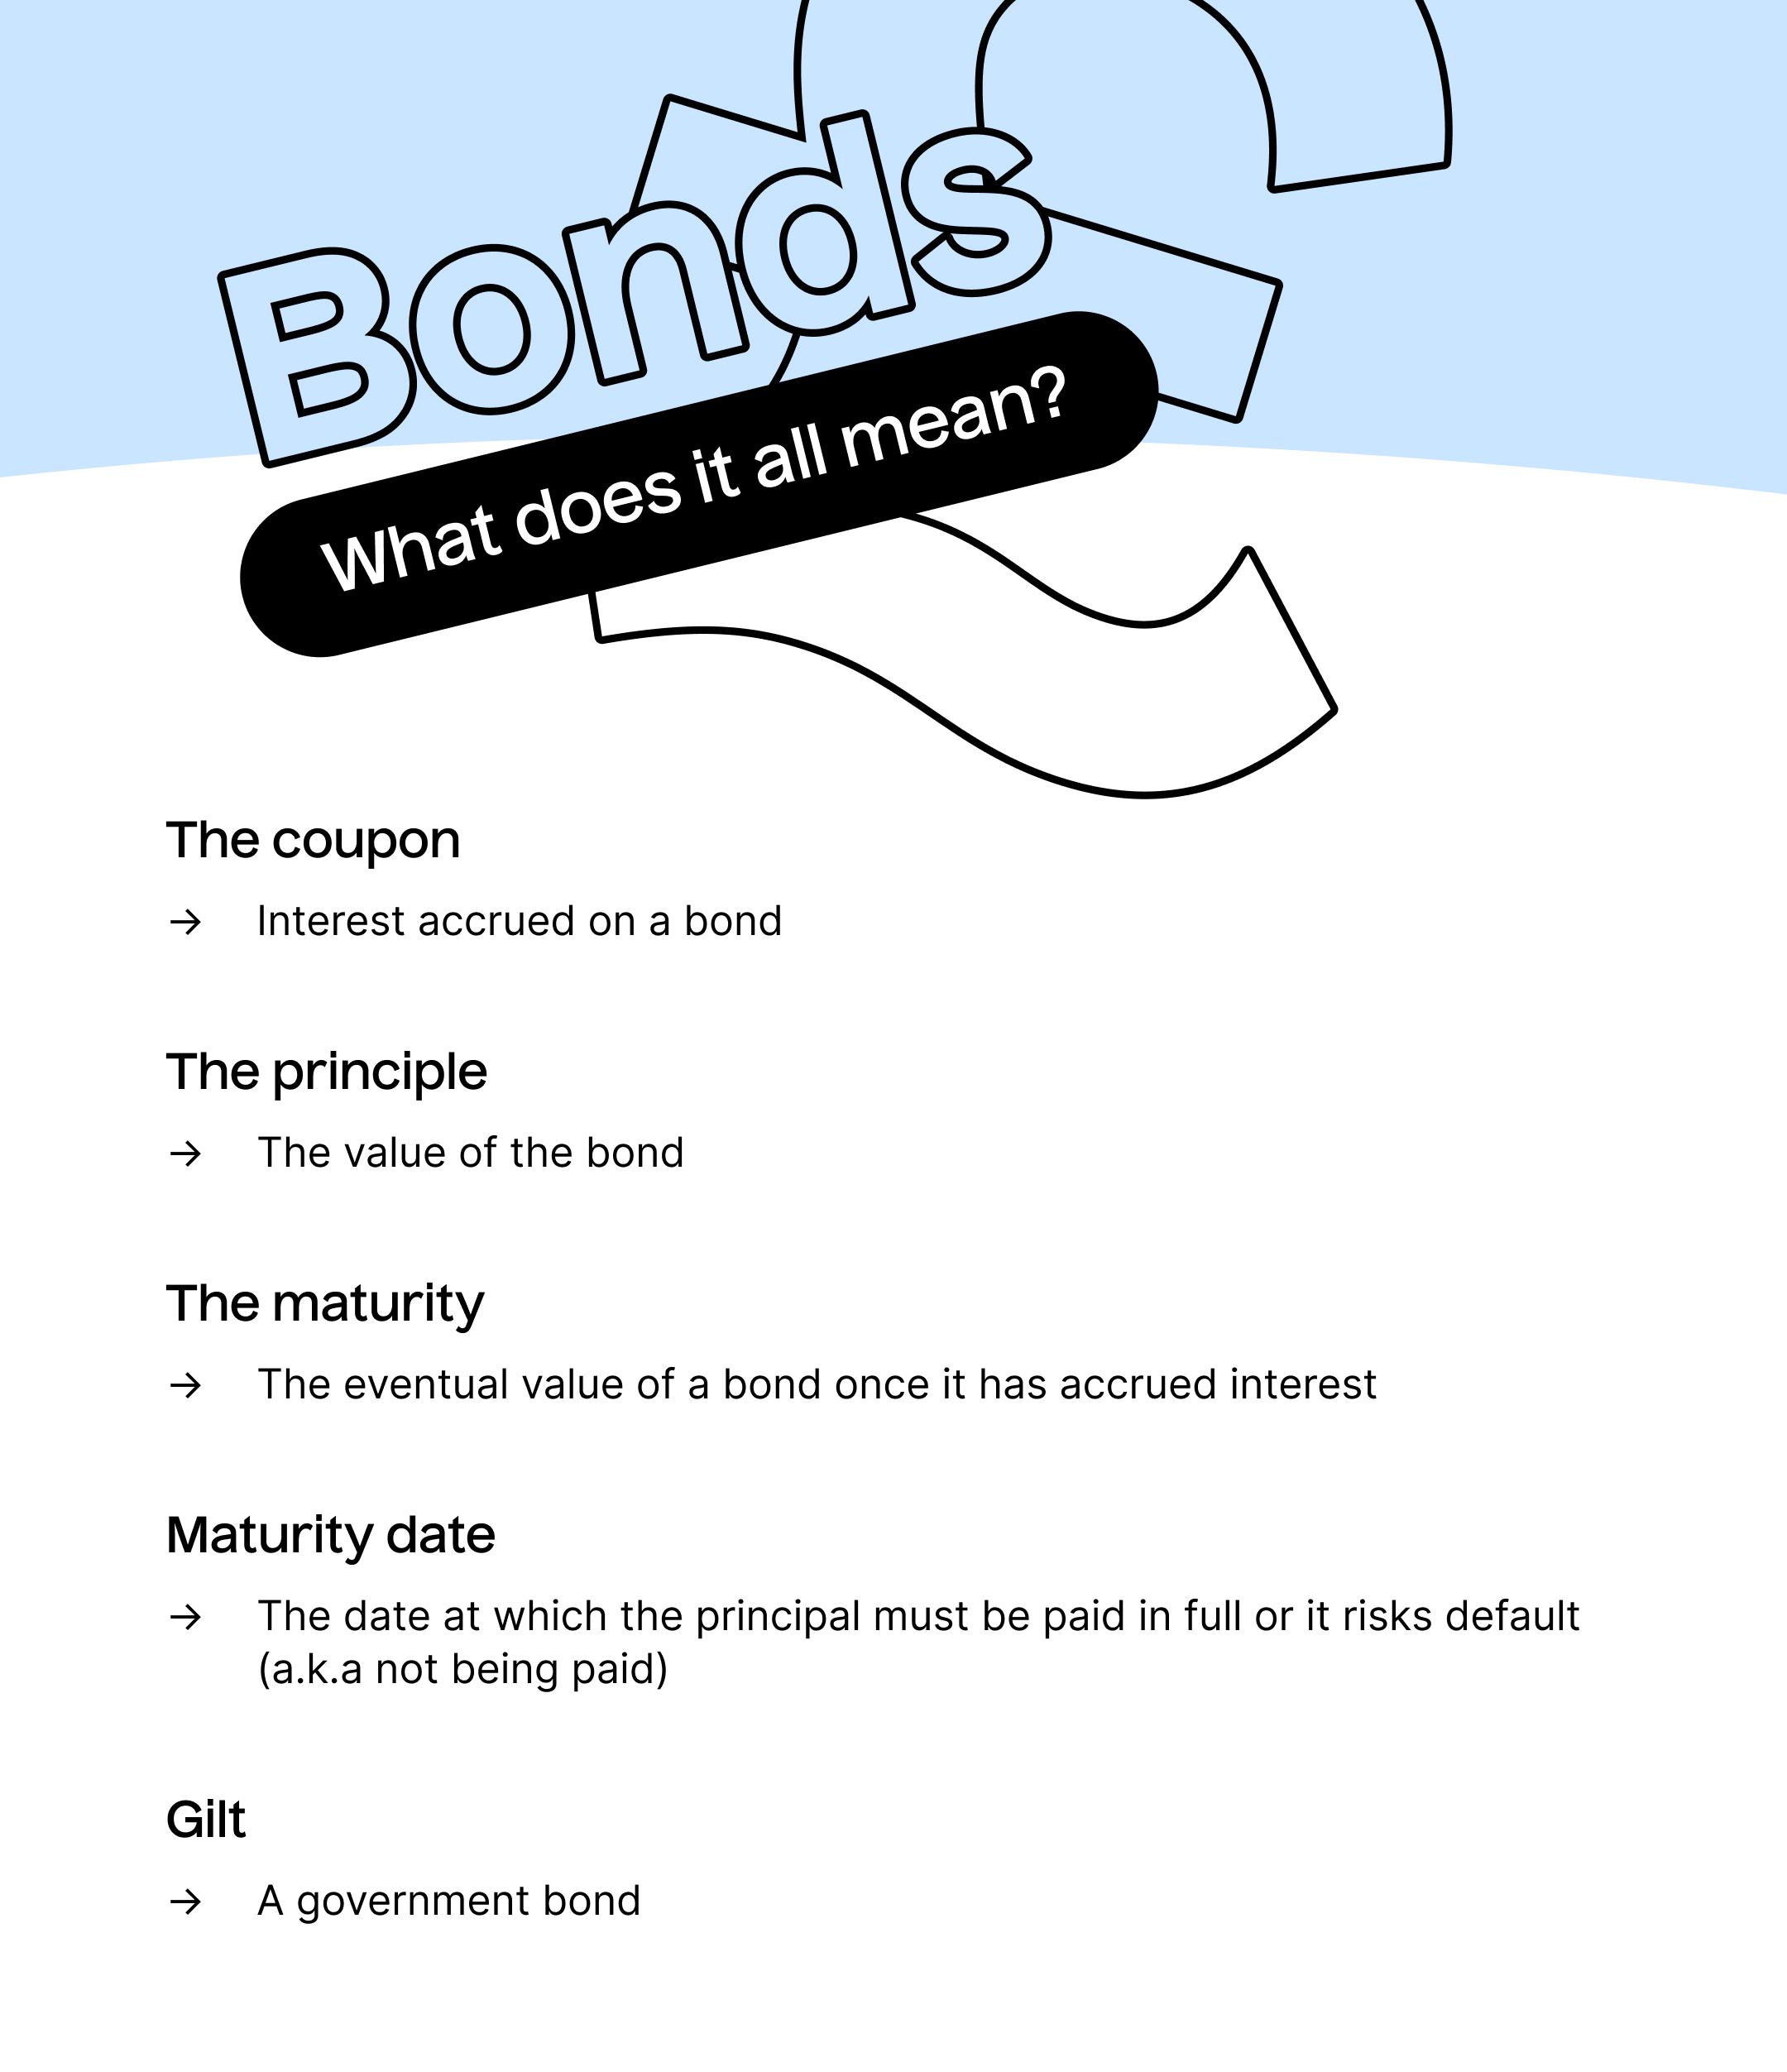 Bonds - what does it mean?